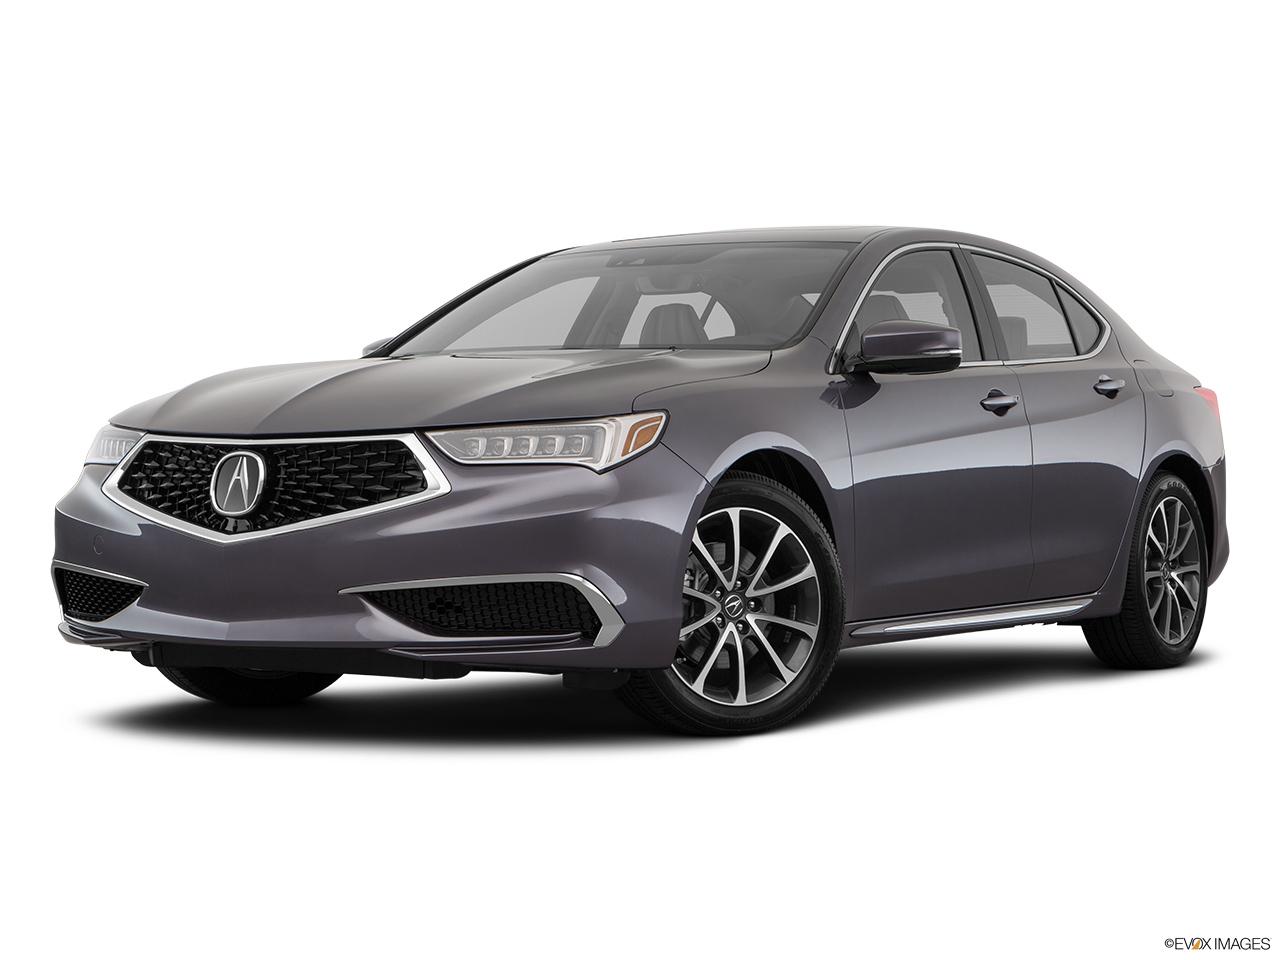 Lease a 2018 Acura TLX Automatic AWD in Canada | Canada ...